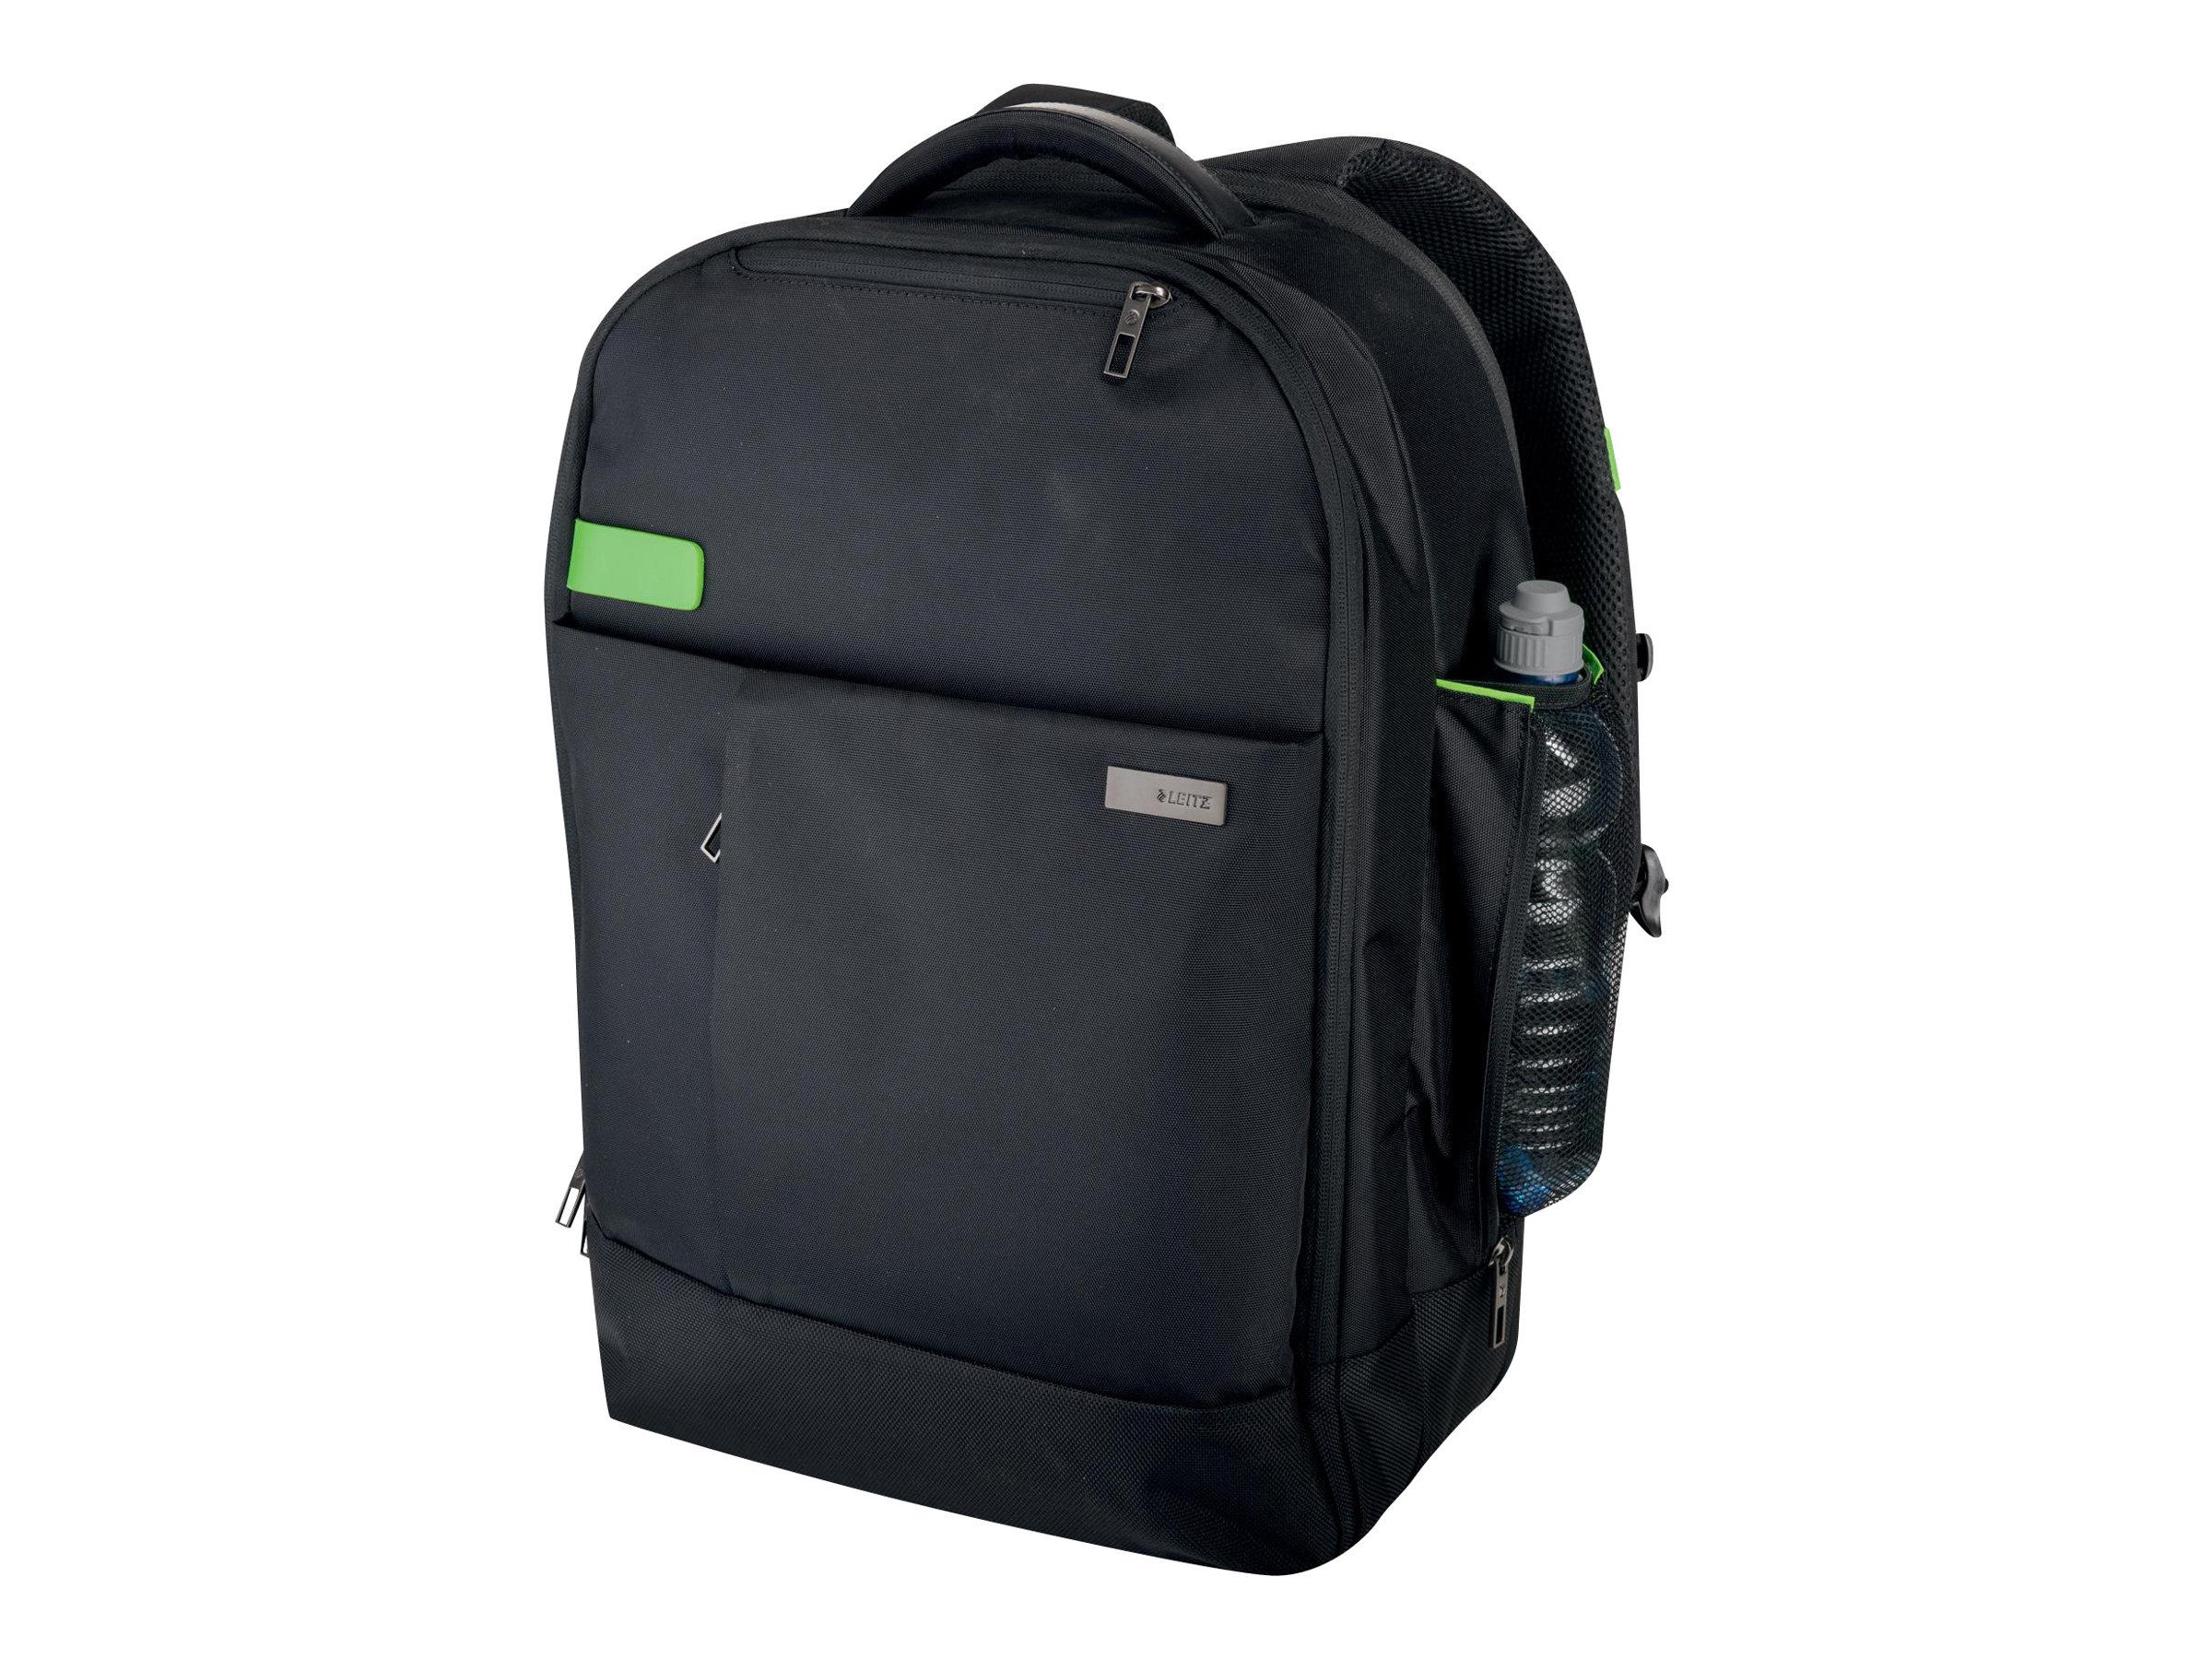 Leitz Complete Smart Traveller - Notebook-Rucksack - 43.9 cm (17.3